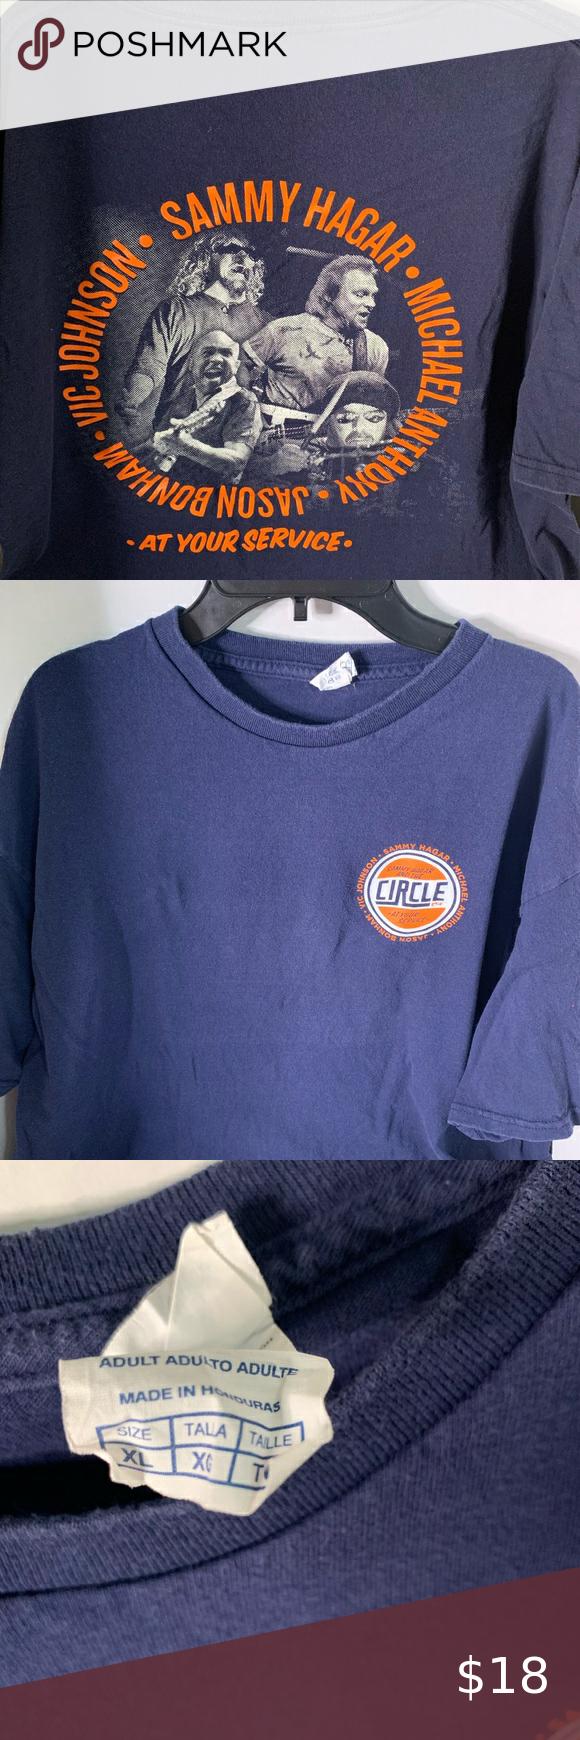 Sammy Hagar And The Circle Shirt In 2020 Navy Shirt Fashion Sale Clothes Design